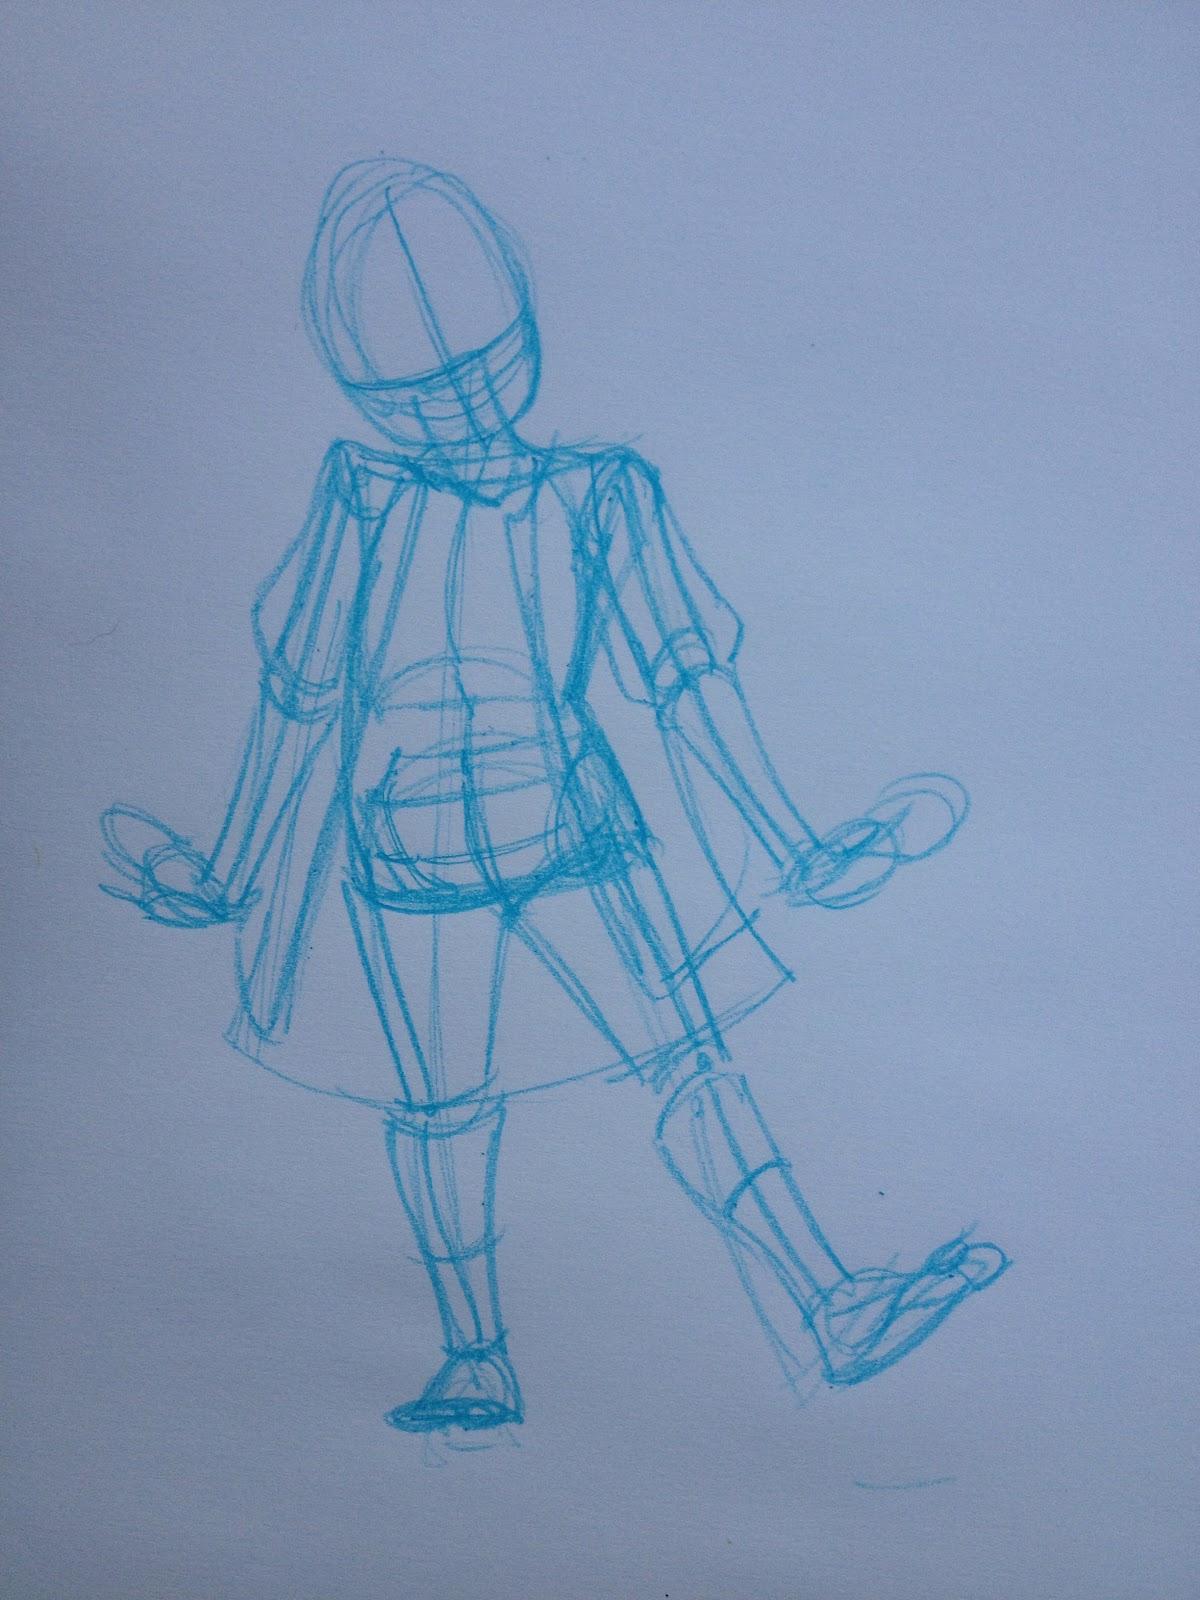 1200x1600 Nattosoup Studio Art And Process Blog Drawing Process Pencil Sketch